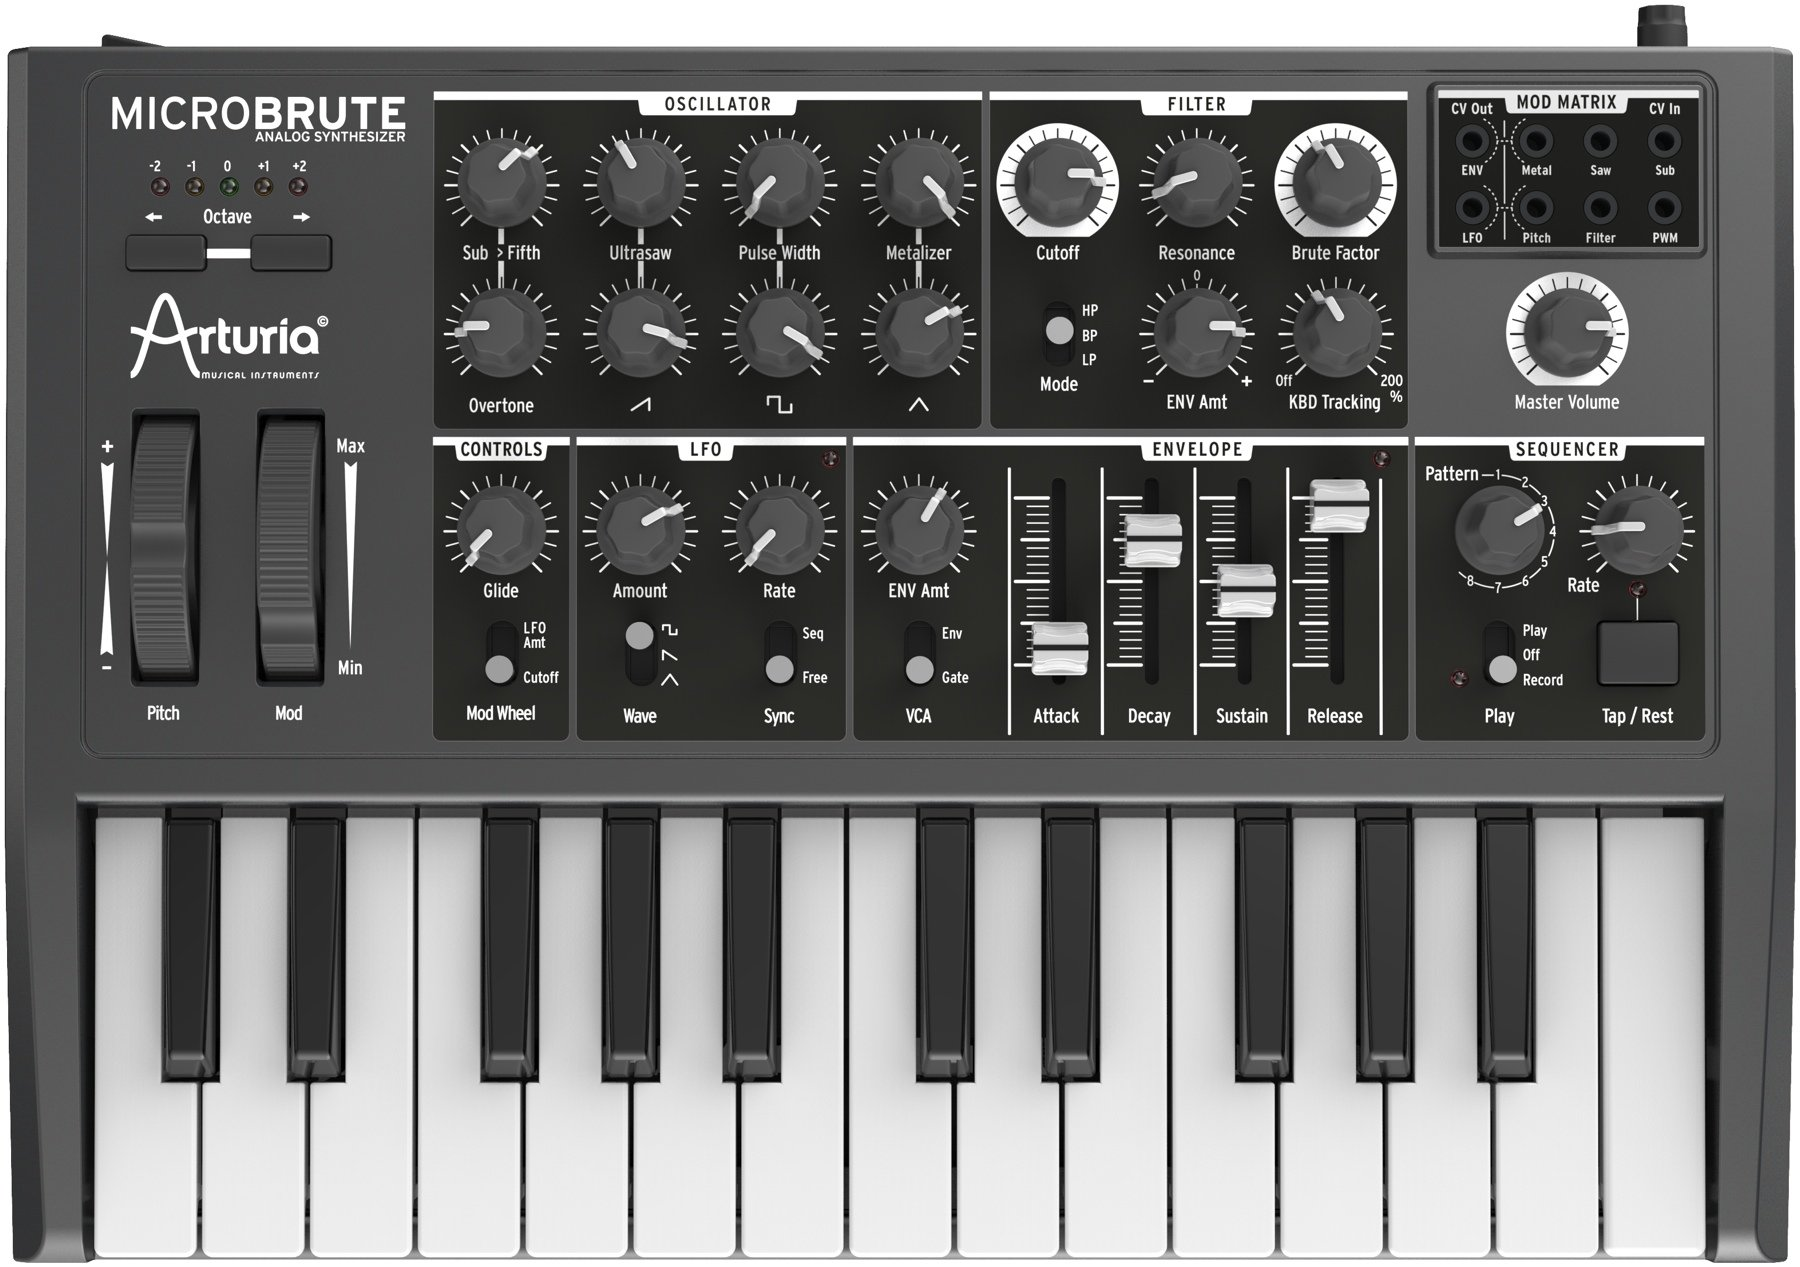 Arturia MICROBRUTE Analog Synthesizer w/ Pig Hog PH10 Instrument Cable - Bundle by Arturia (Image #2)